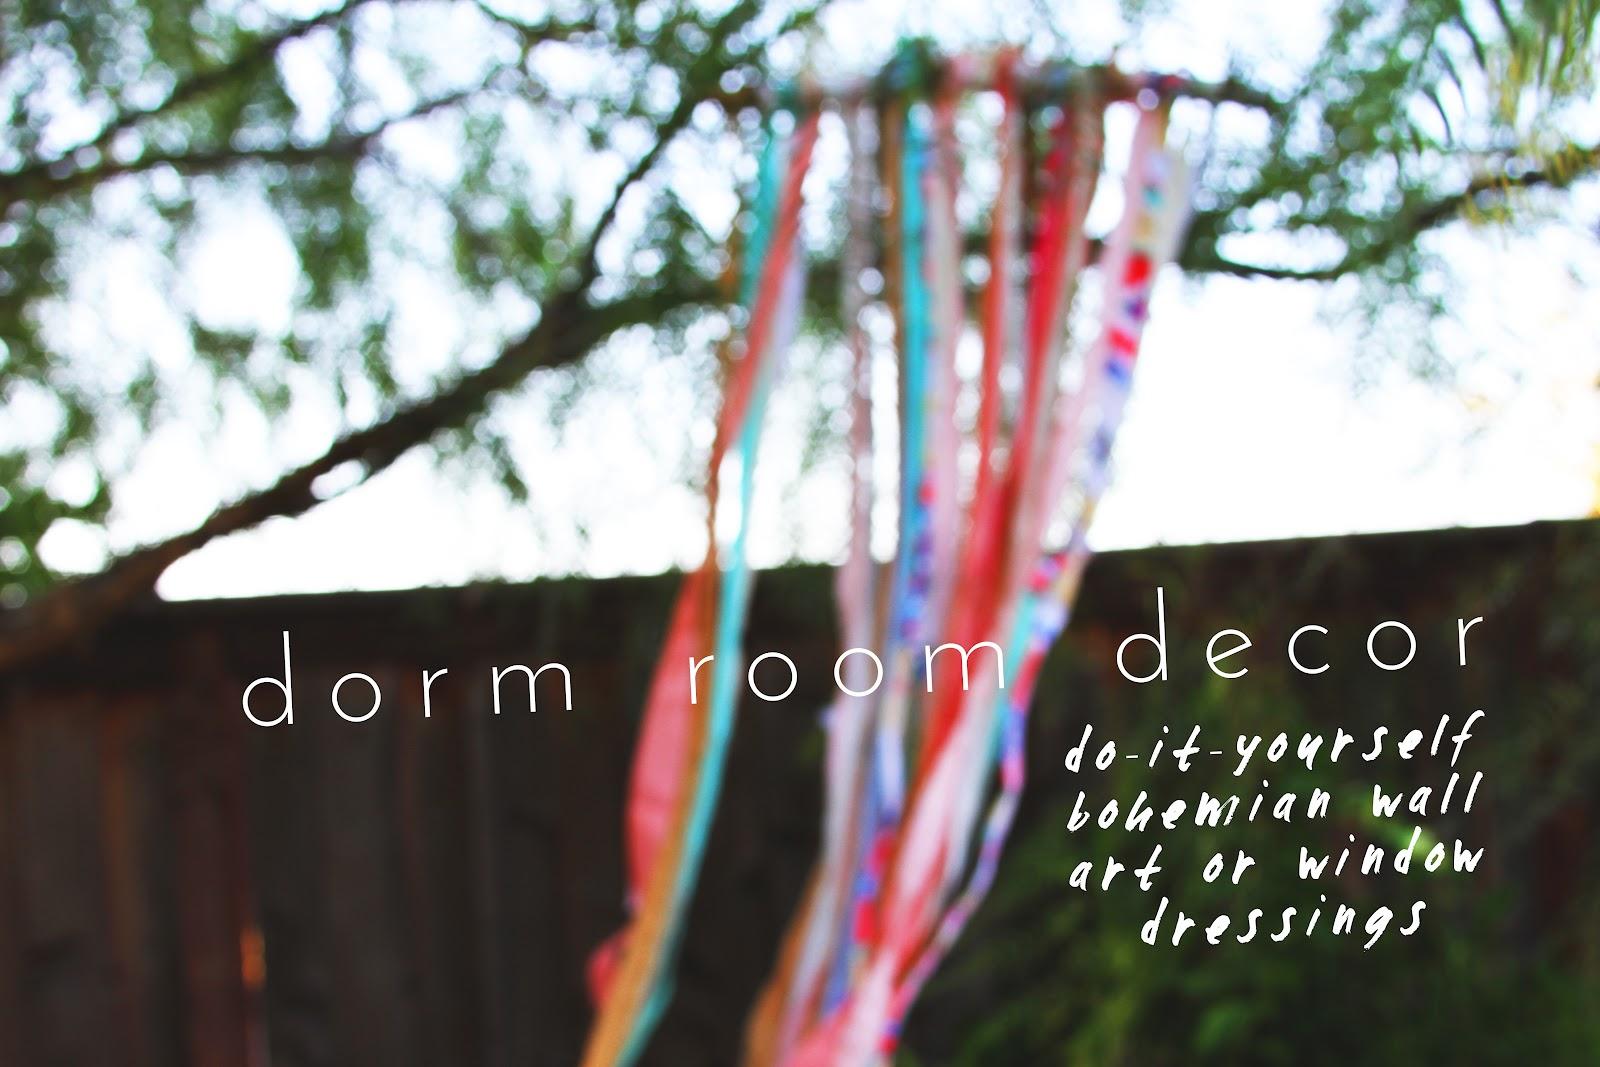 I Like Fall Diy Blog Diy Dorm Room Decor Bohemian Wall Art